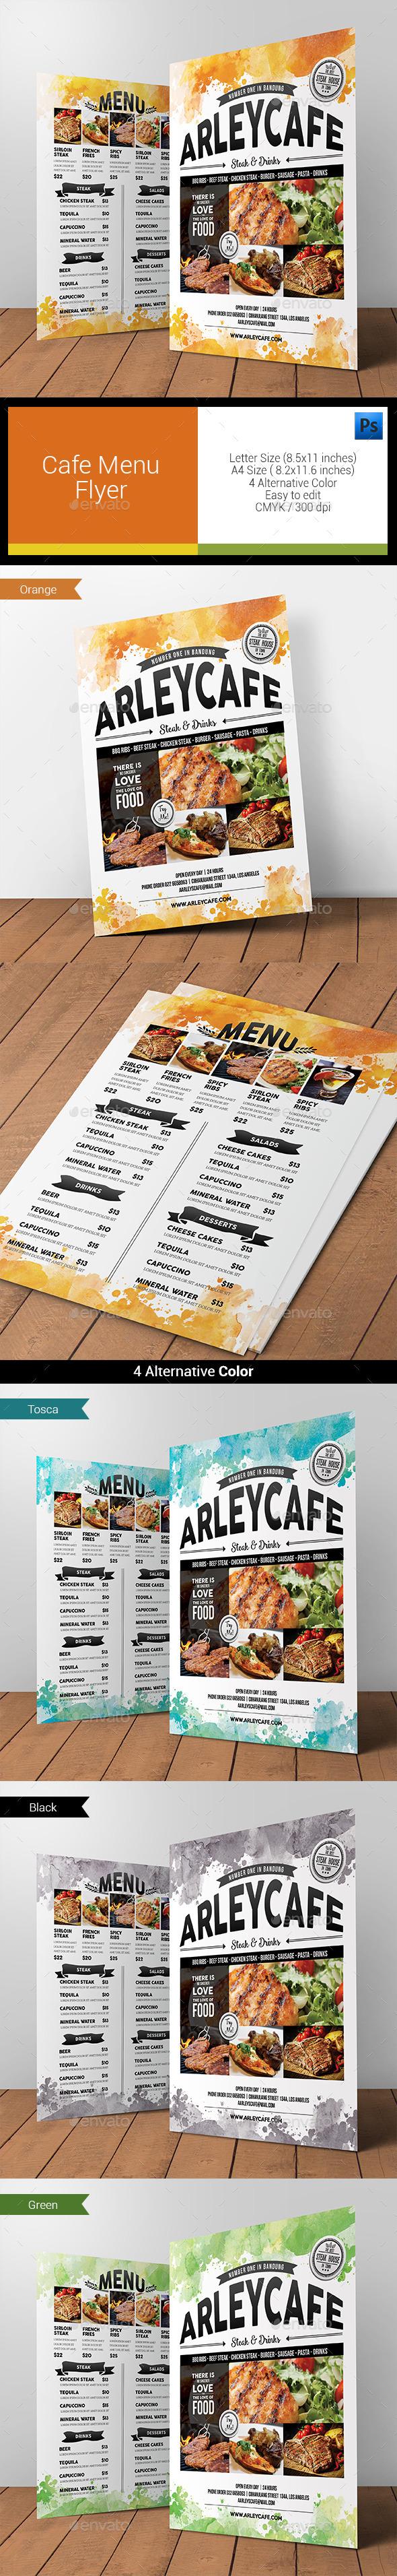 Watercolor Cafe Menu Flyer  - Food Menus Print Templates